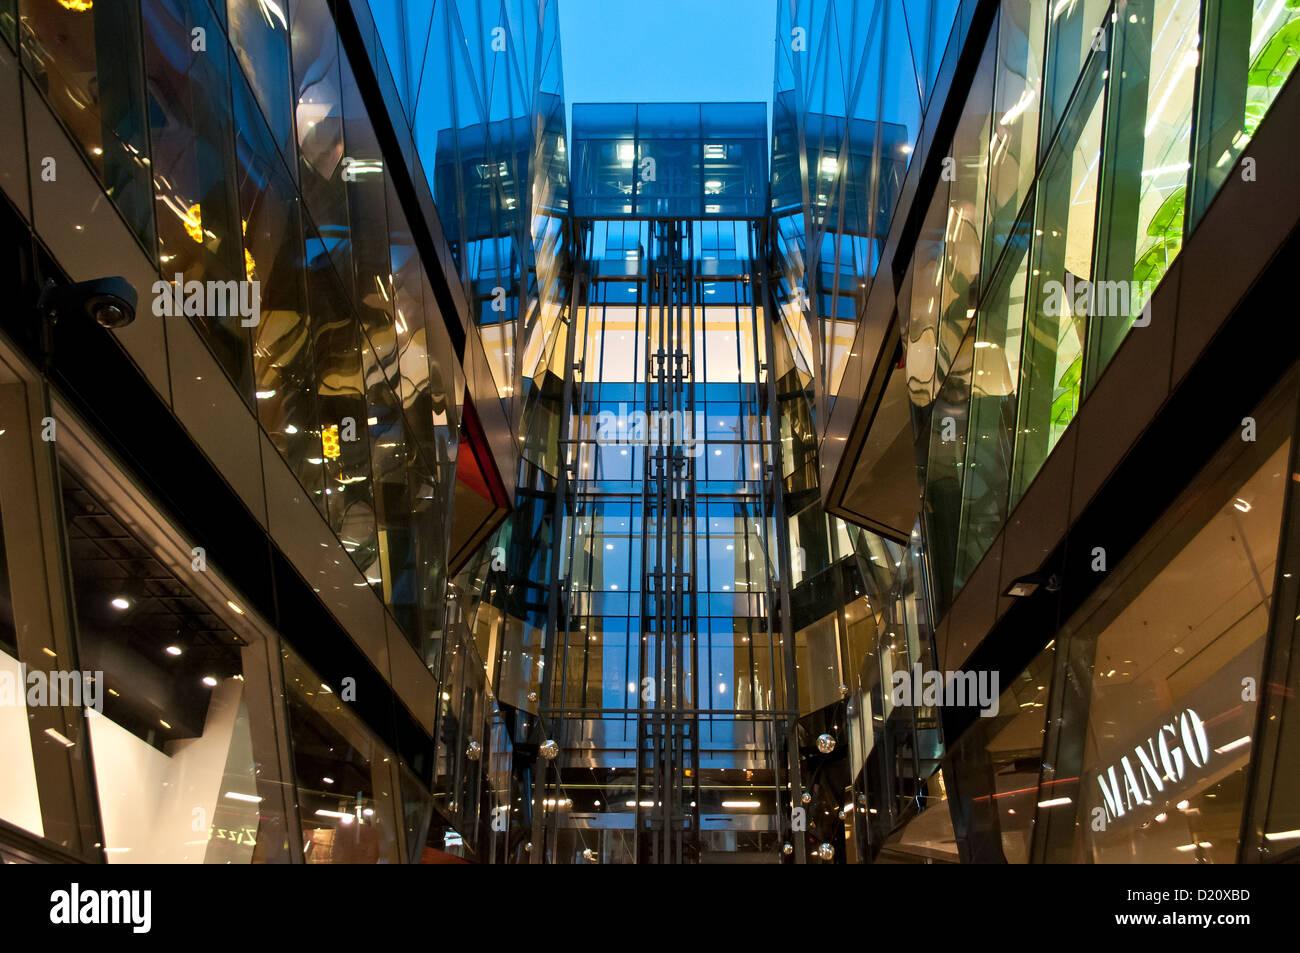 One New Change shopping centre, City of London, UK - Stock Image